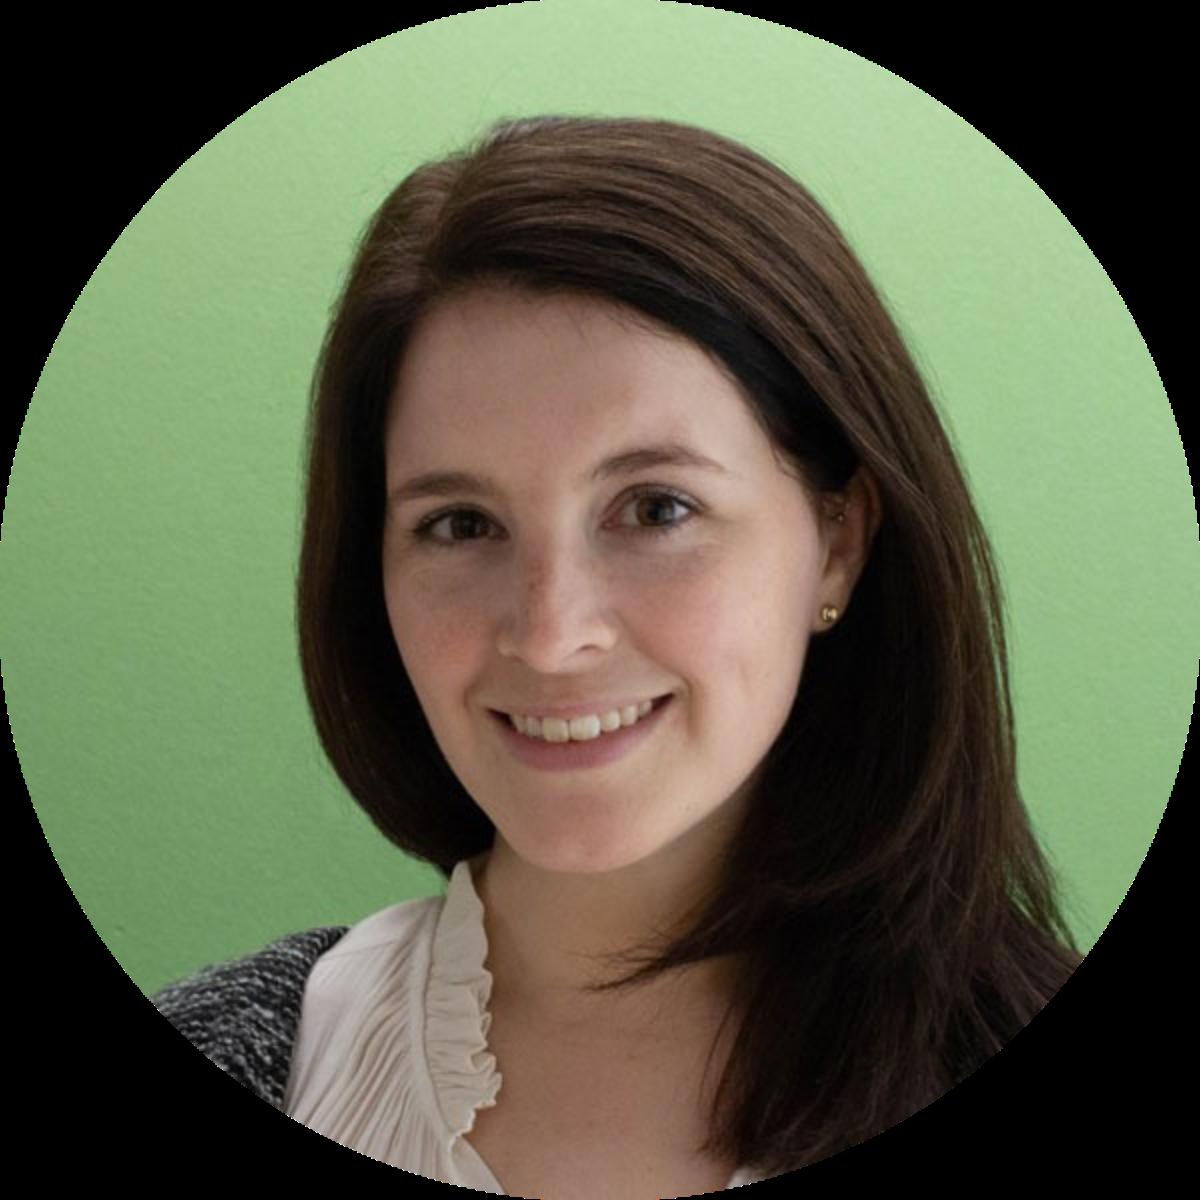 Sarah Flickenger - Synthetic Biologist